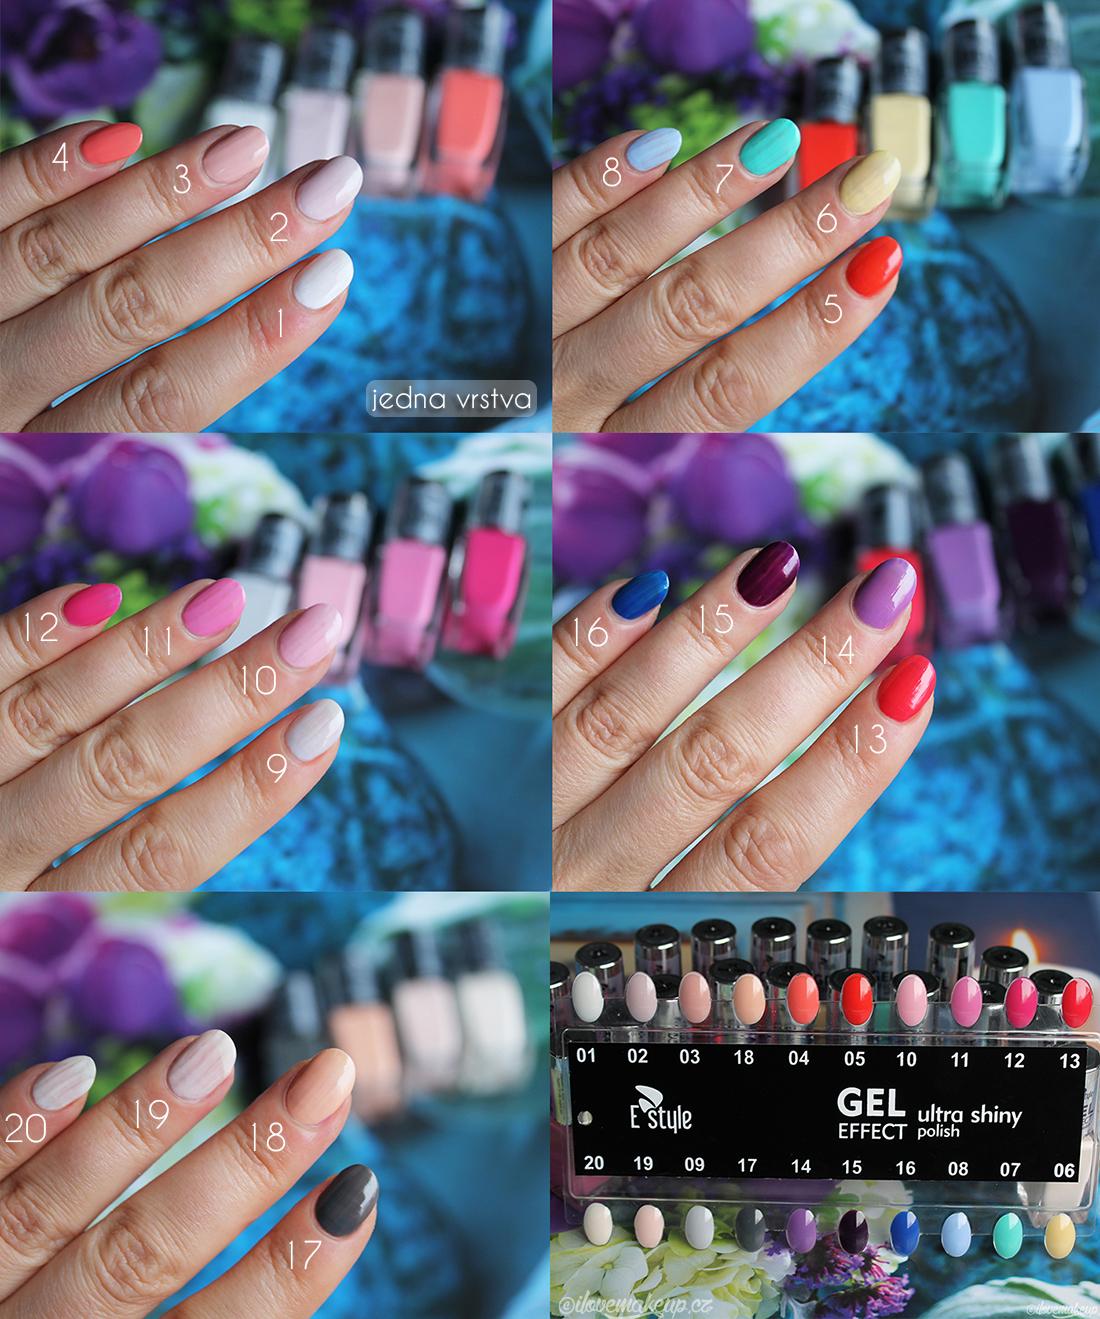 E Style Gel Effect Laky Na Nehty Ilovemakeup